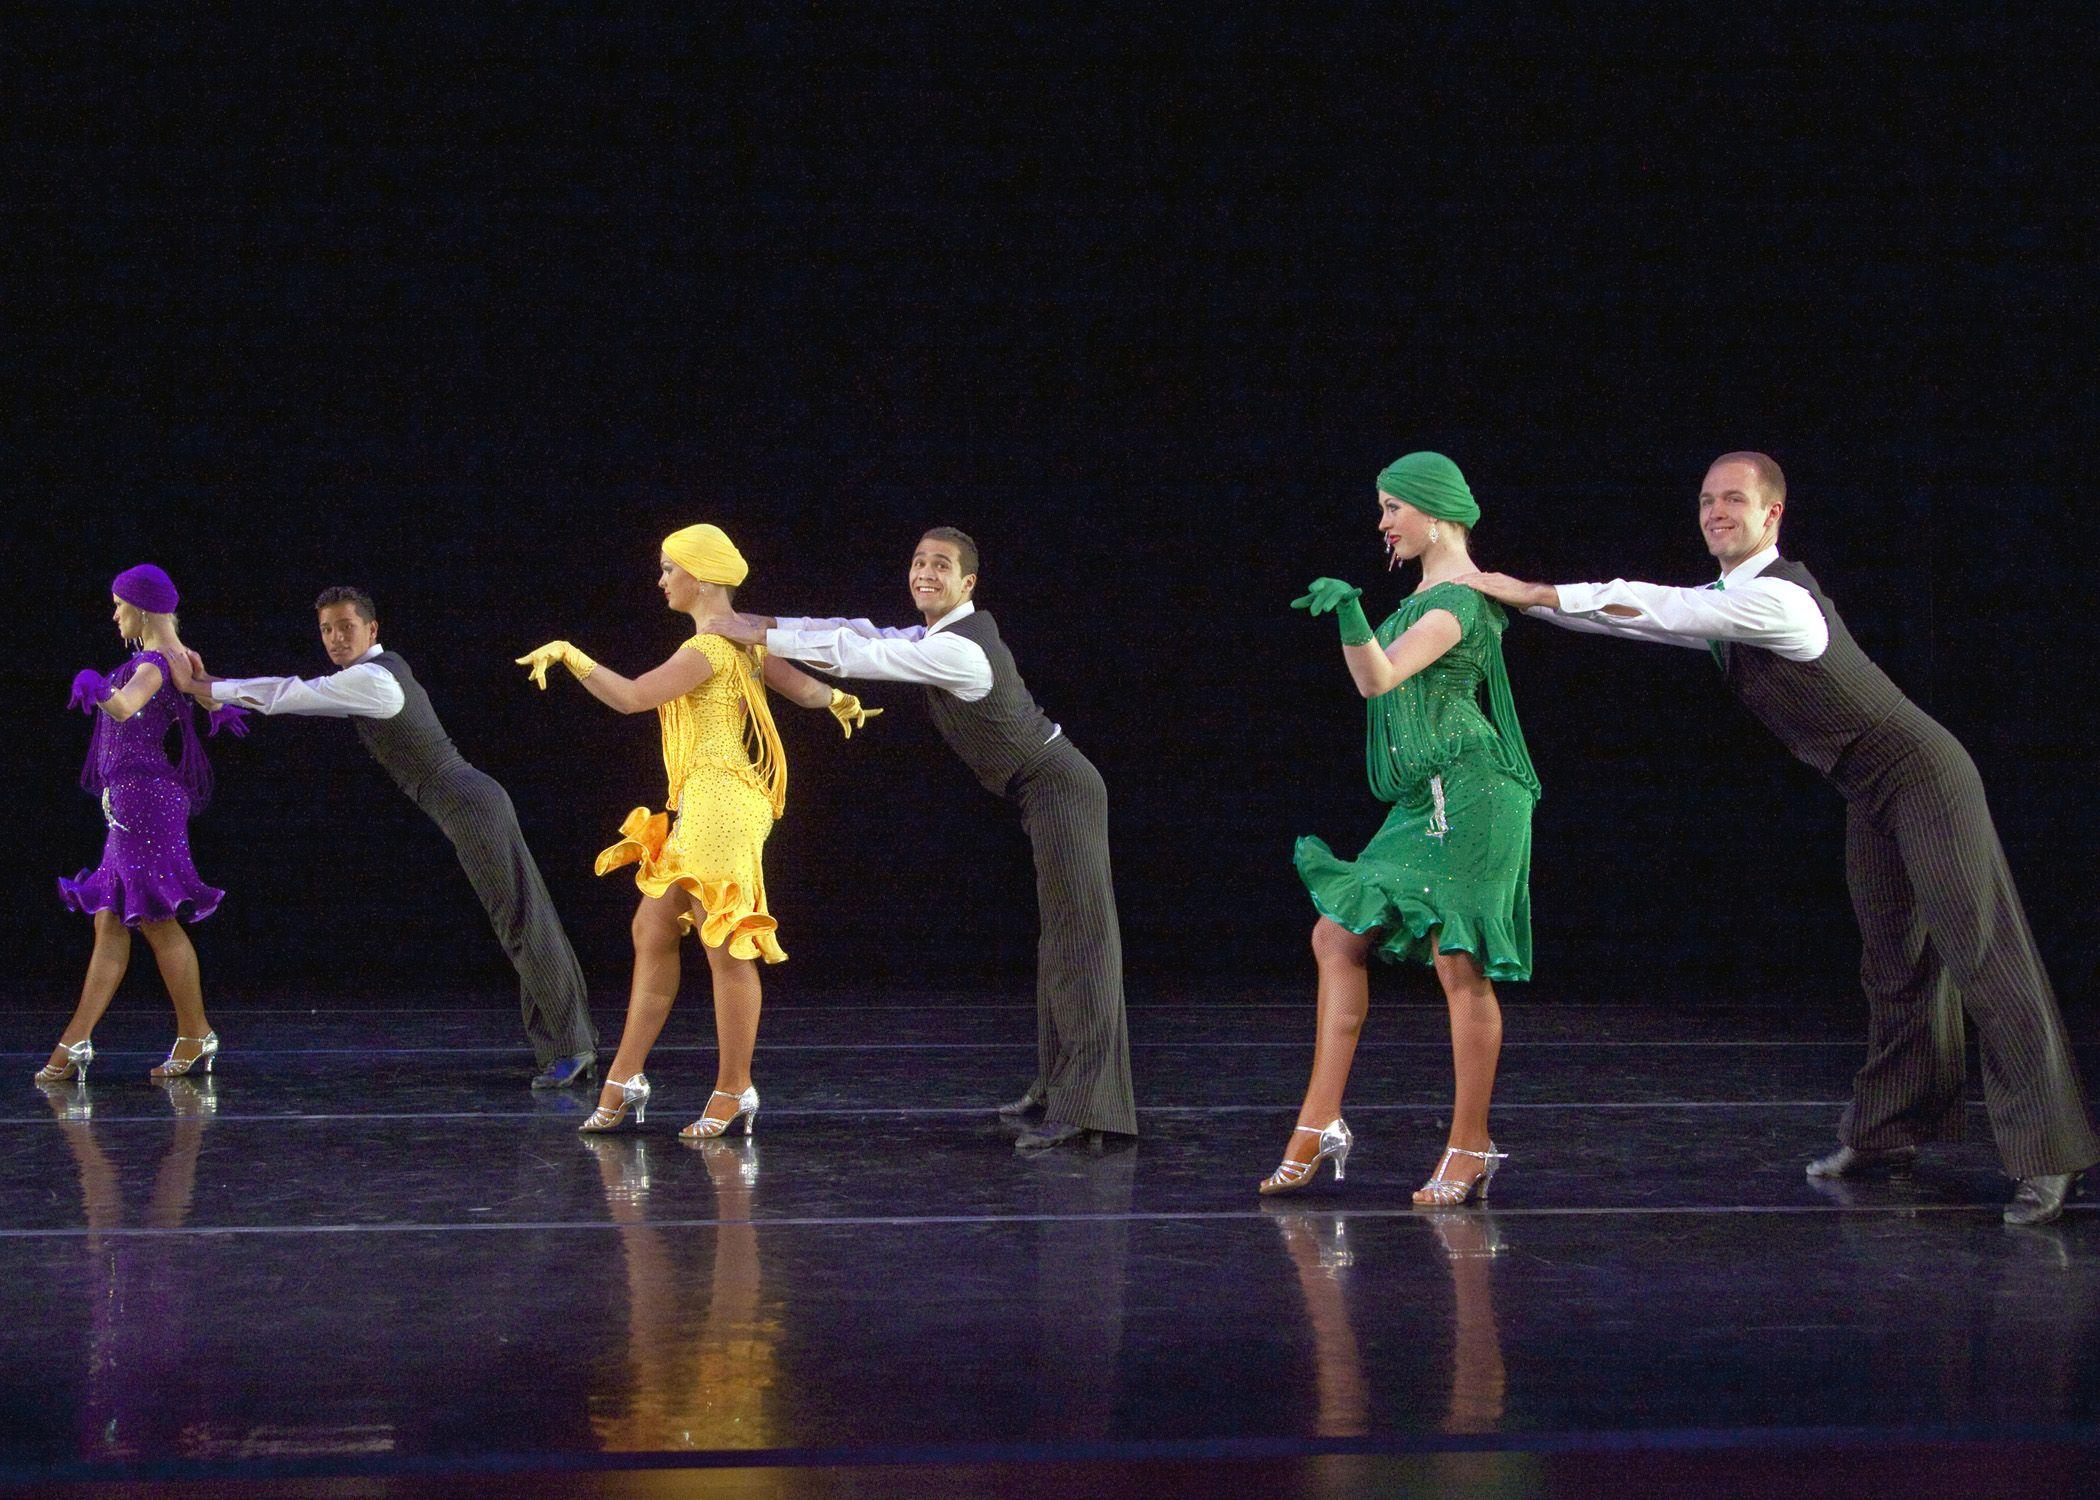 The Golden Cha Cha Byu Ballroom Dance Company Celebrates 50 Years Dance Company Ballroom Dance Dance